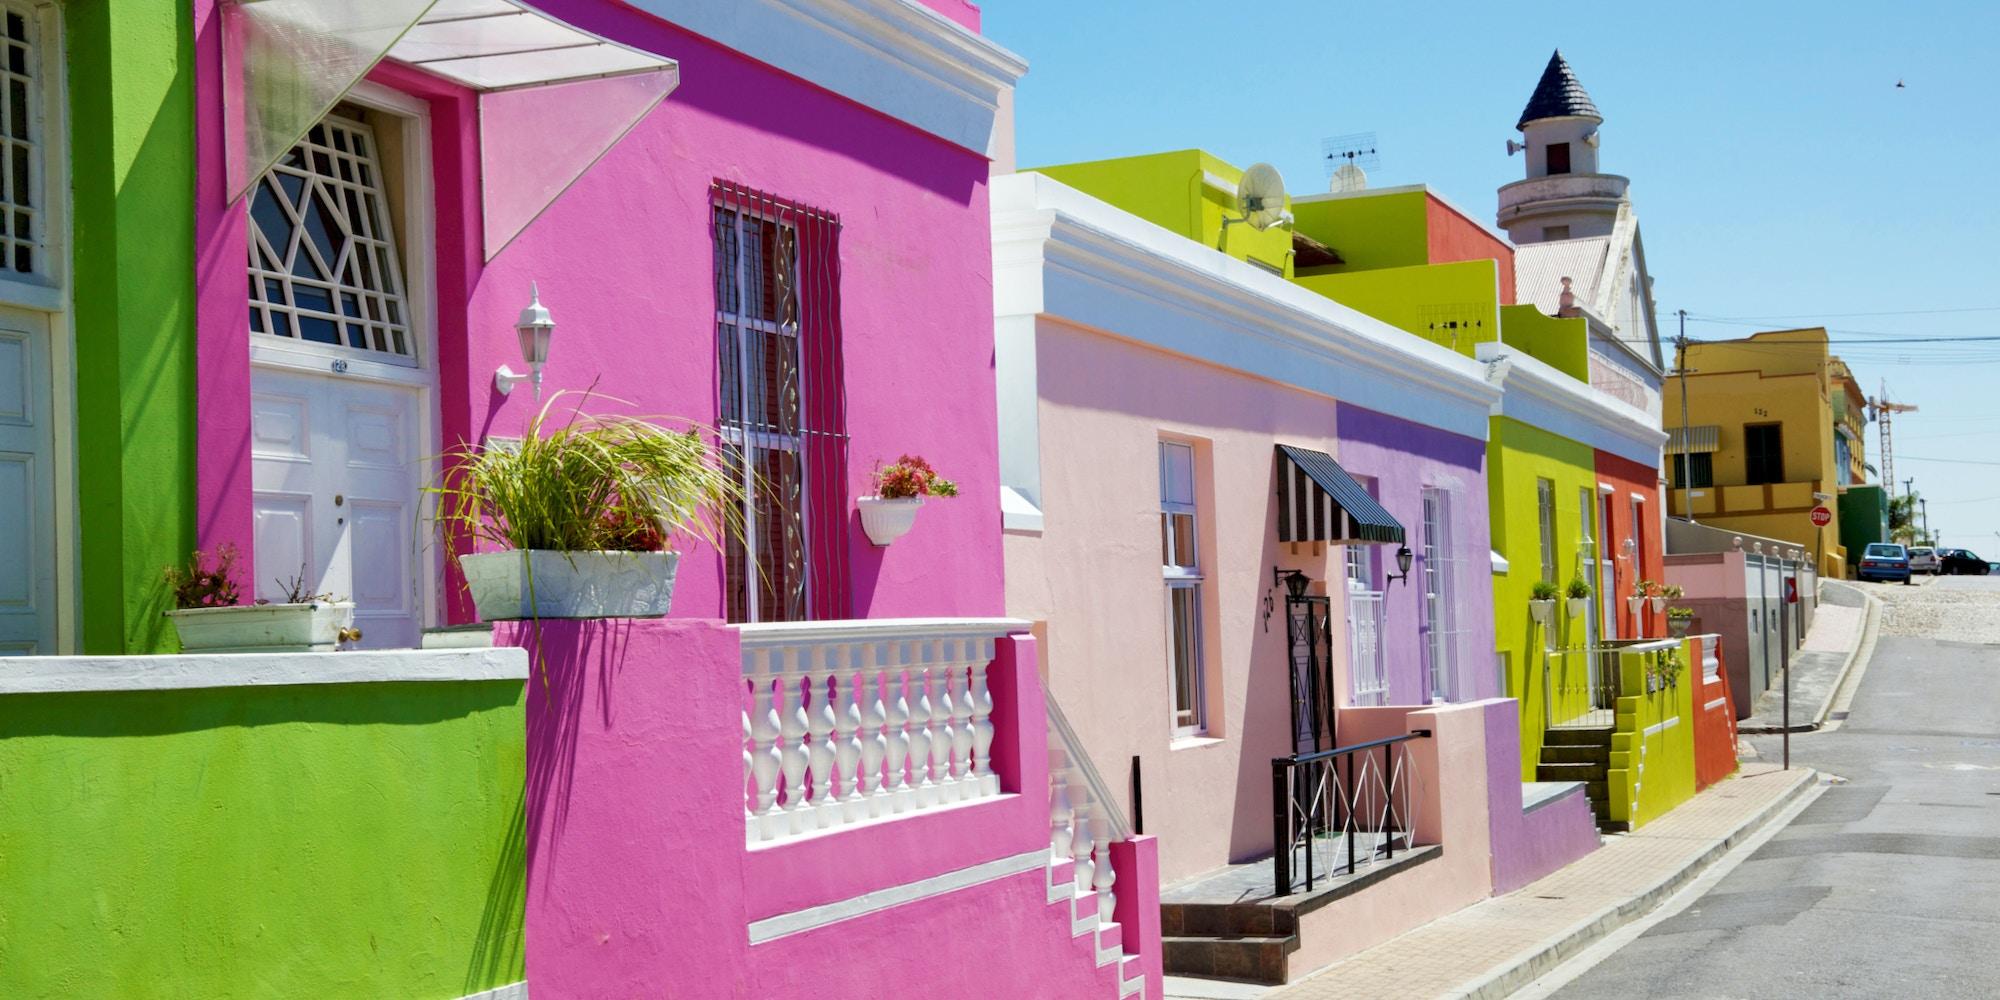 Shutterstock 127396652